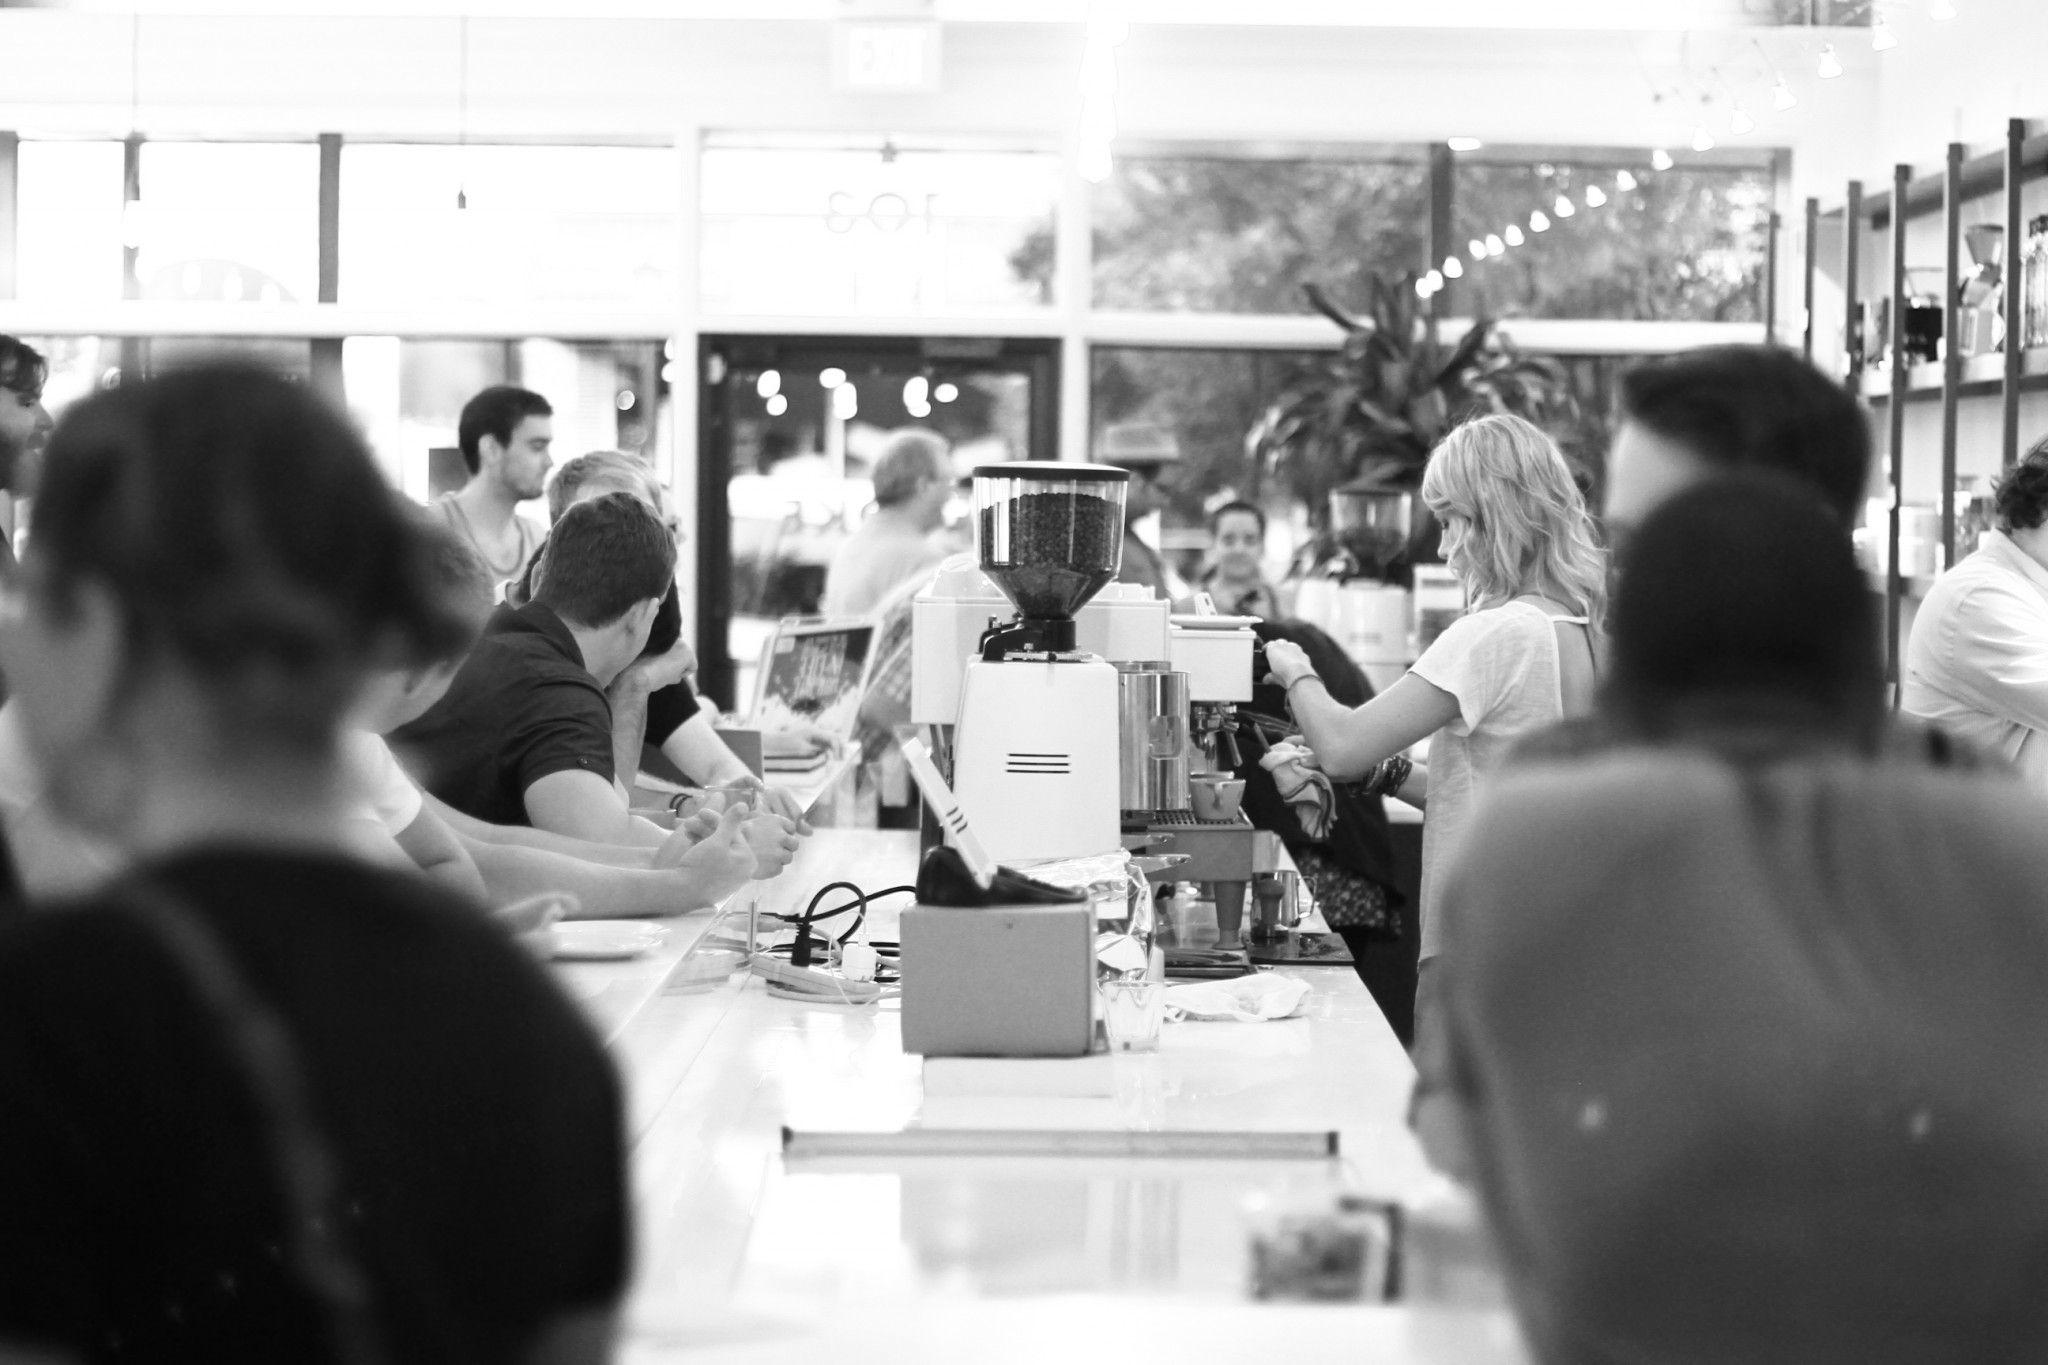 Small Business Success Story: Café Evoke and Citizens Bank of Edmond